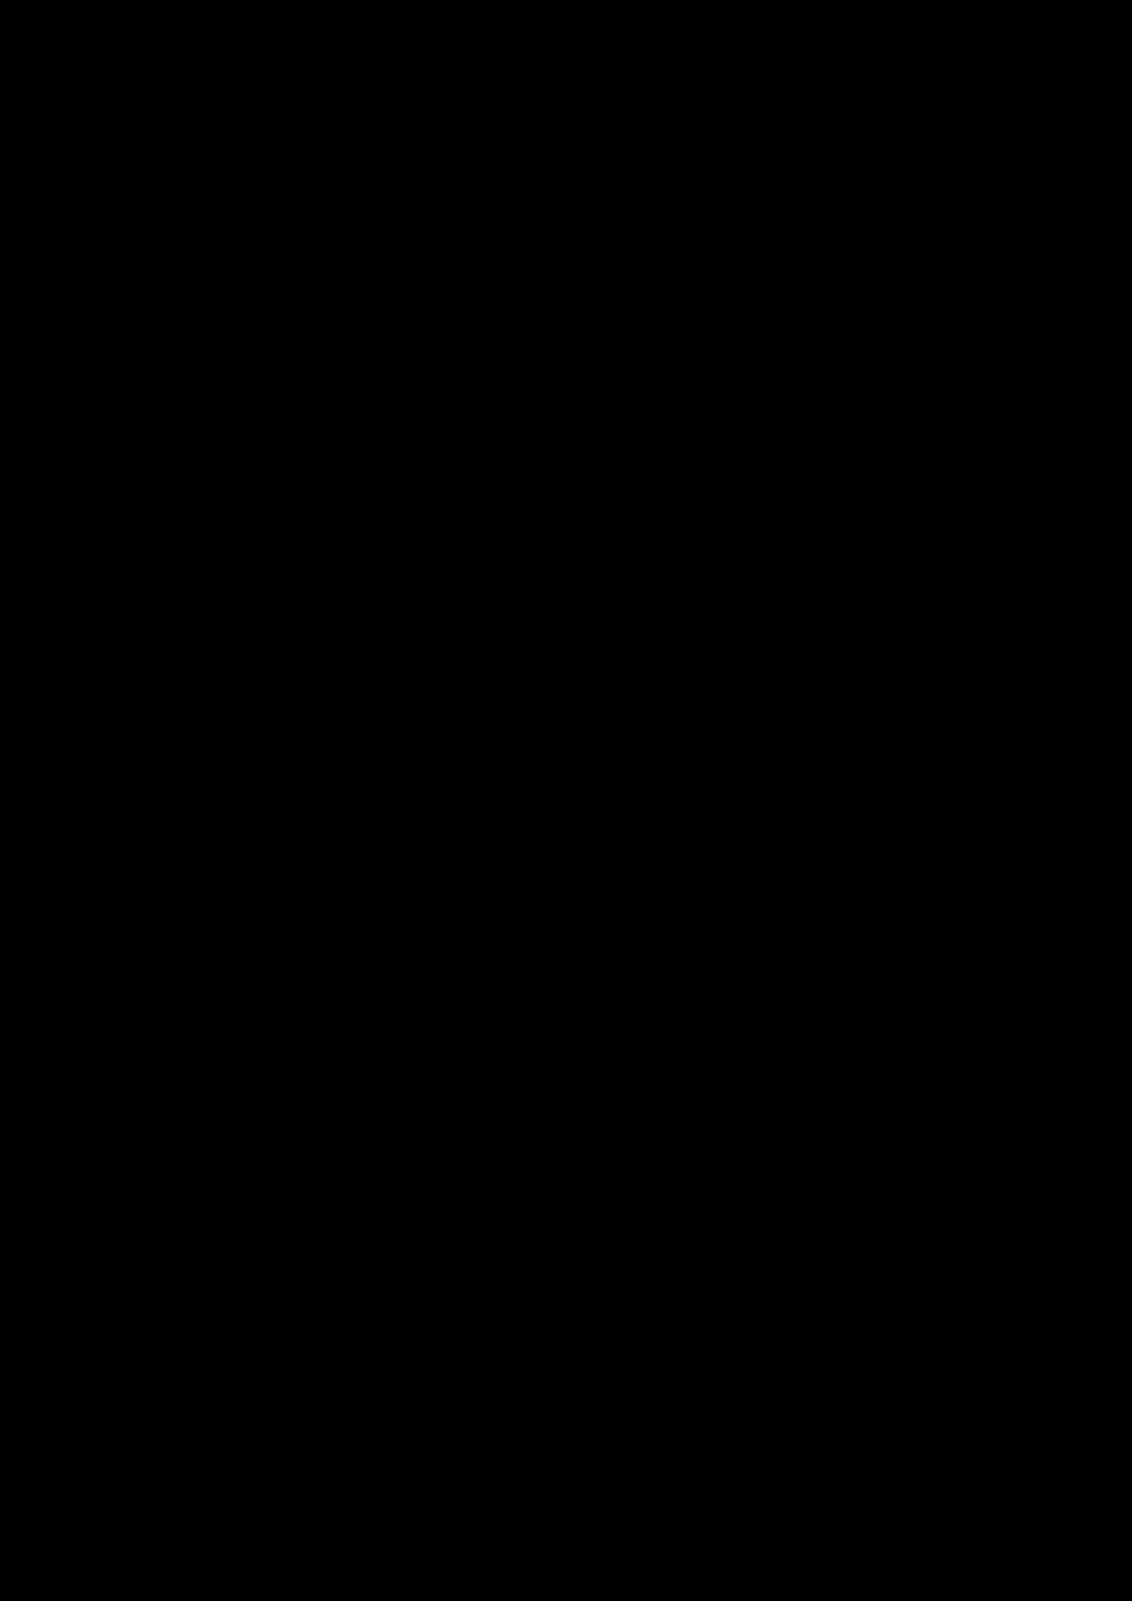 Ten lyubvi slide, Image 33